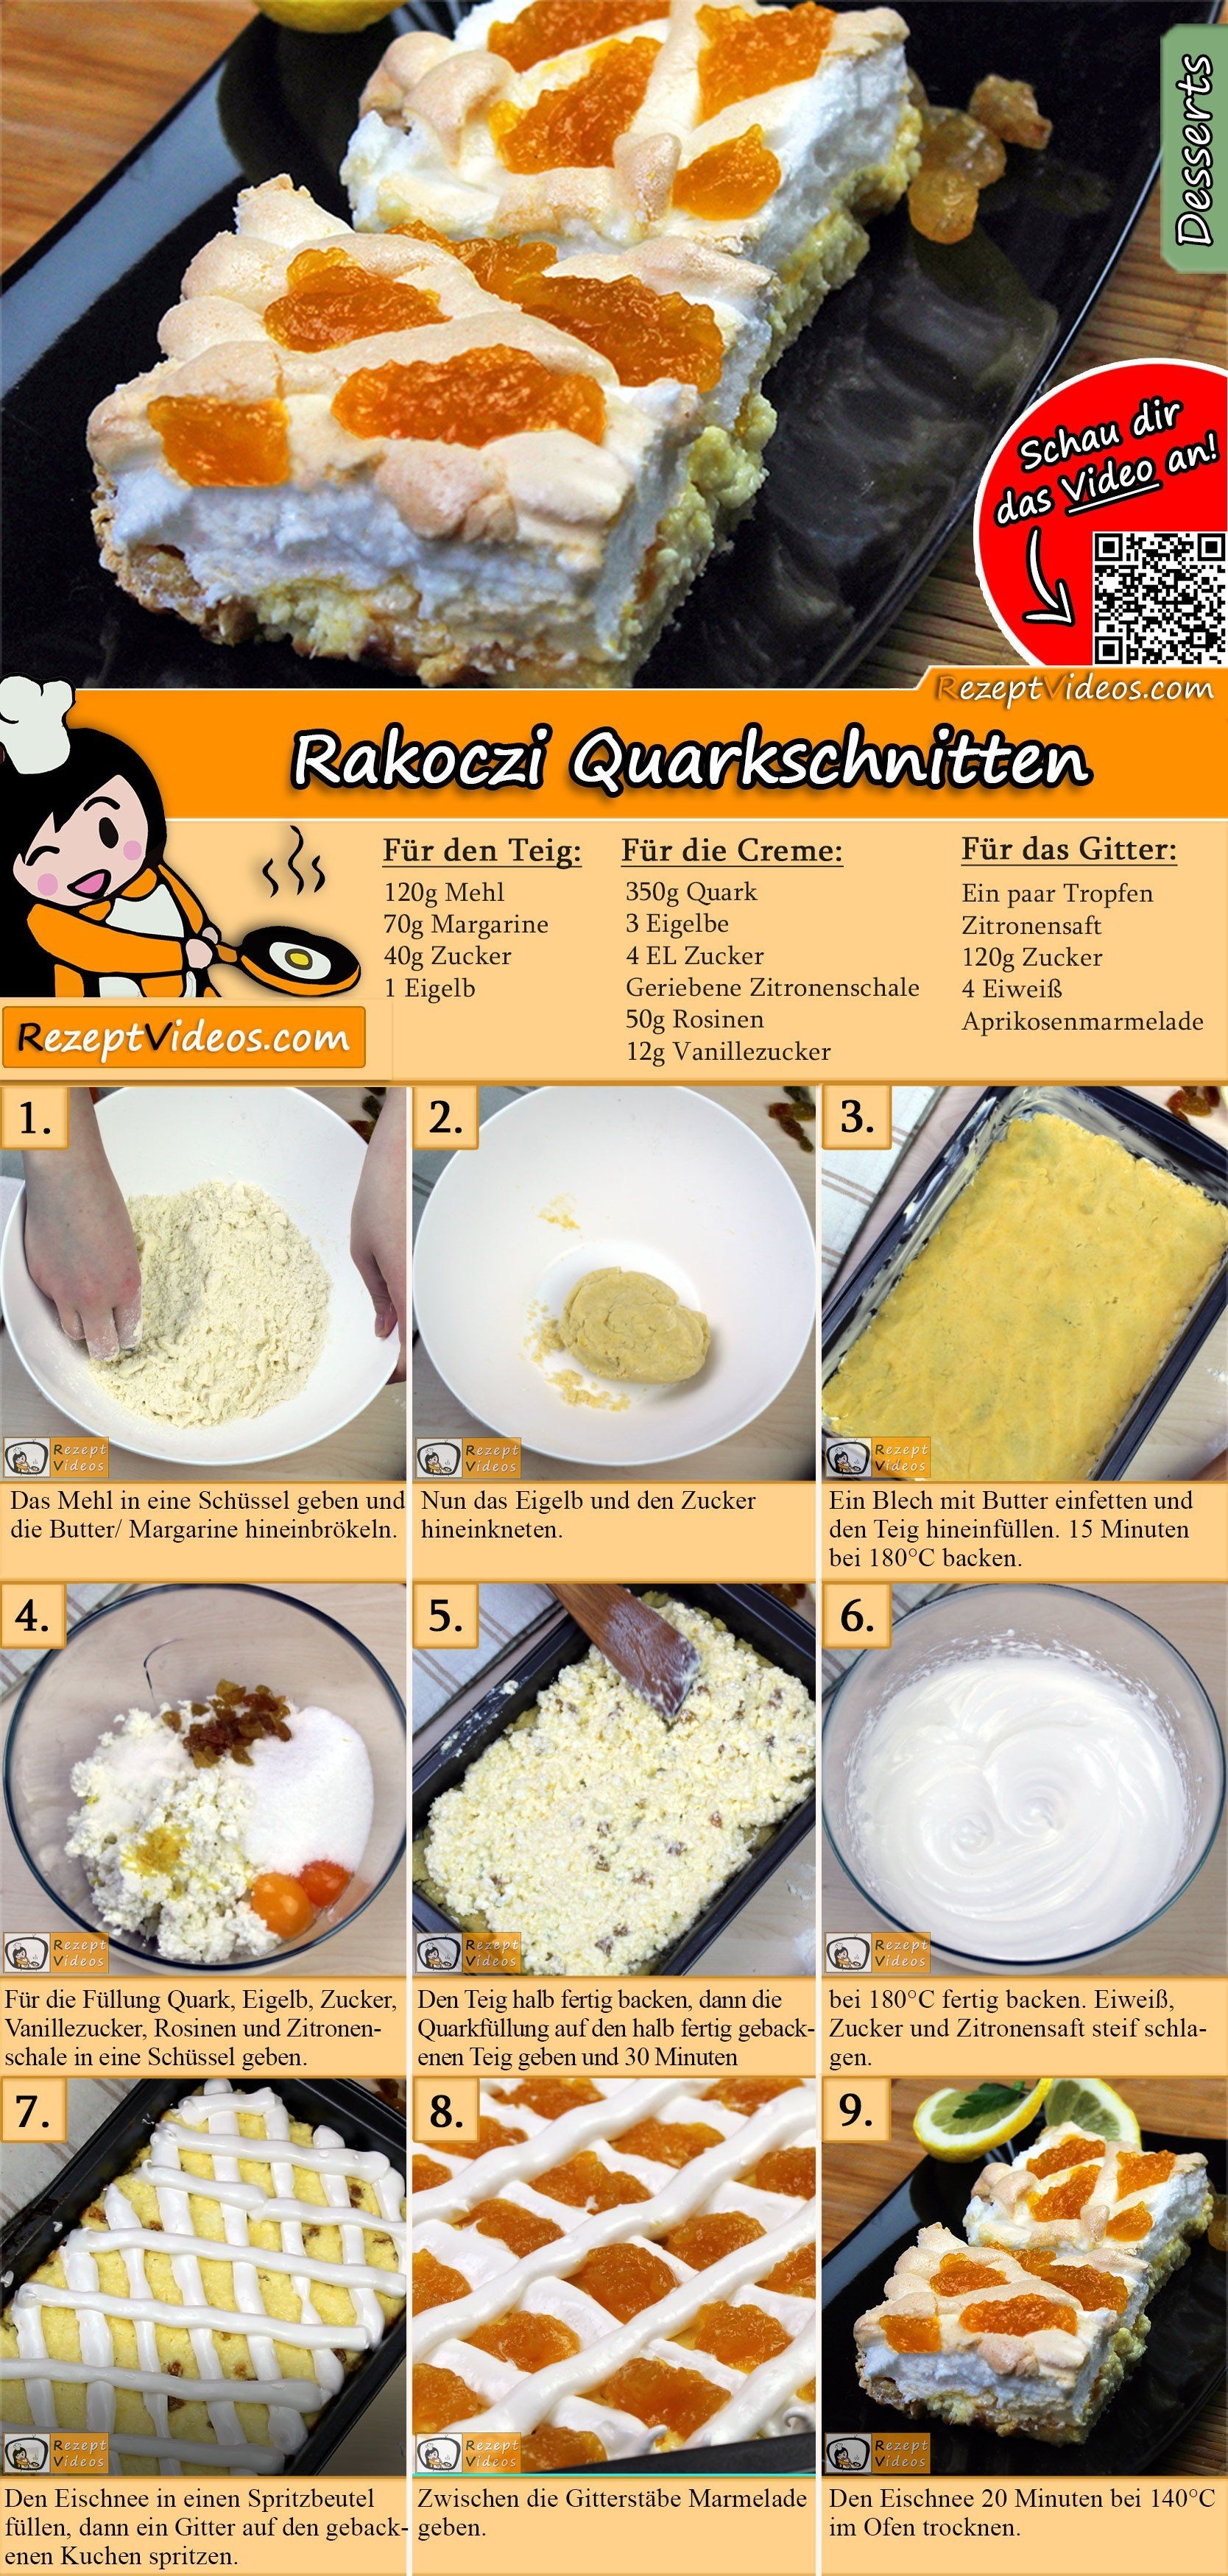 Rakoczi Quarkschnitten Rezept In 2019 Kuchen Rezepte Mit Videos